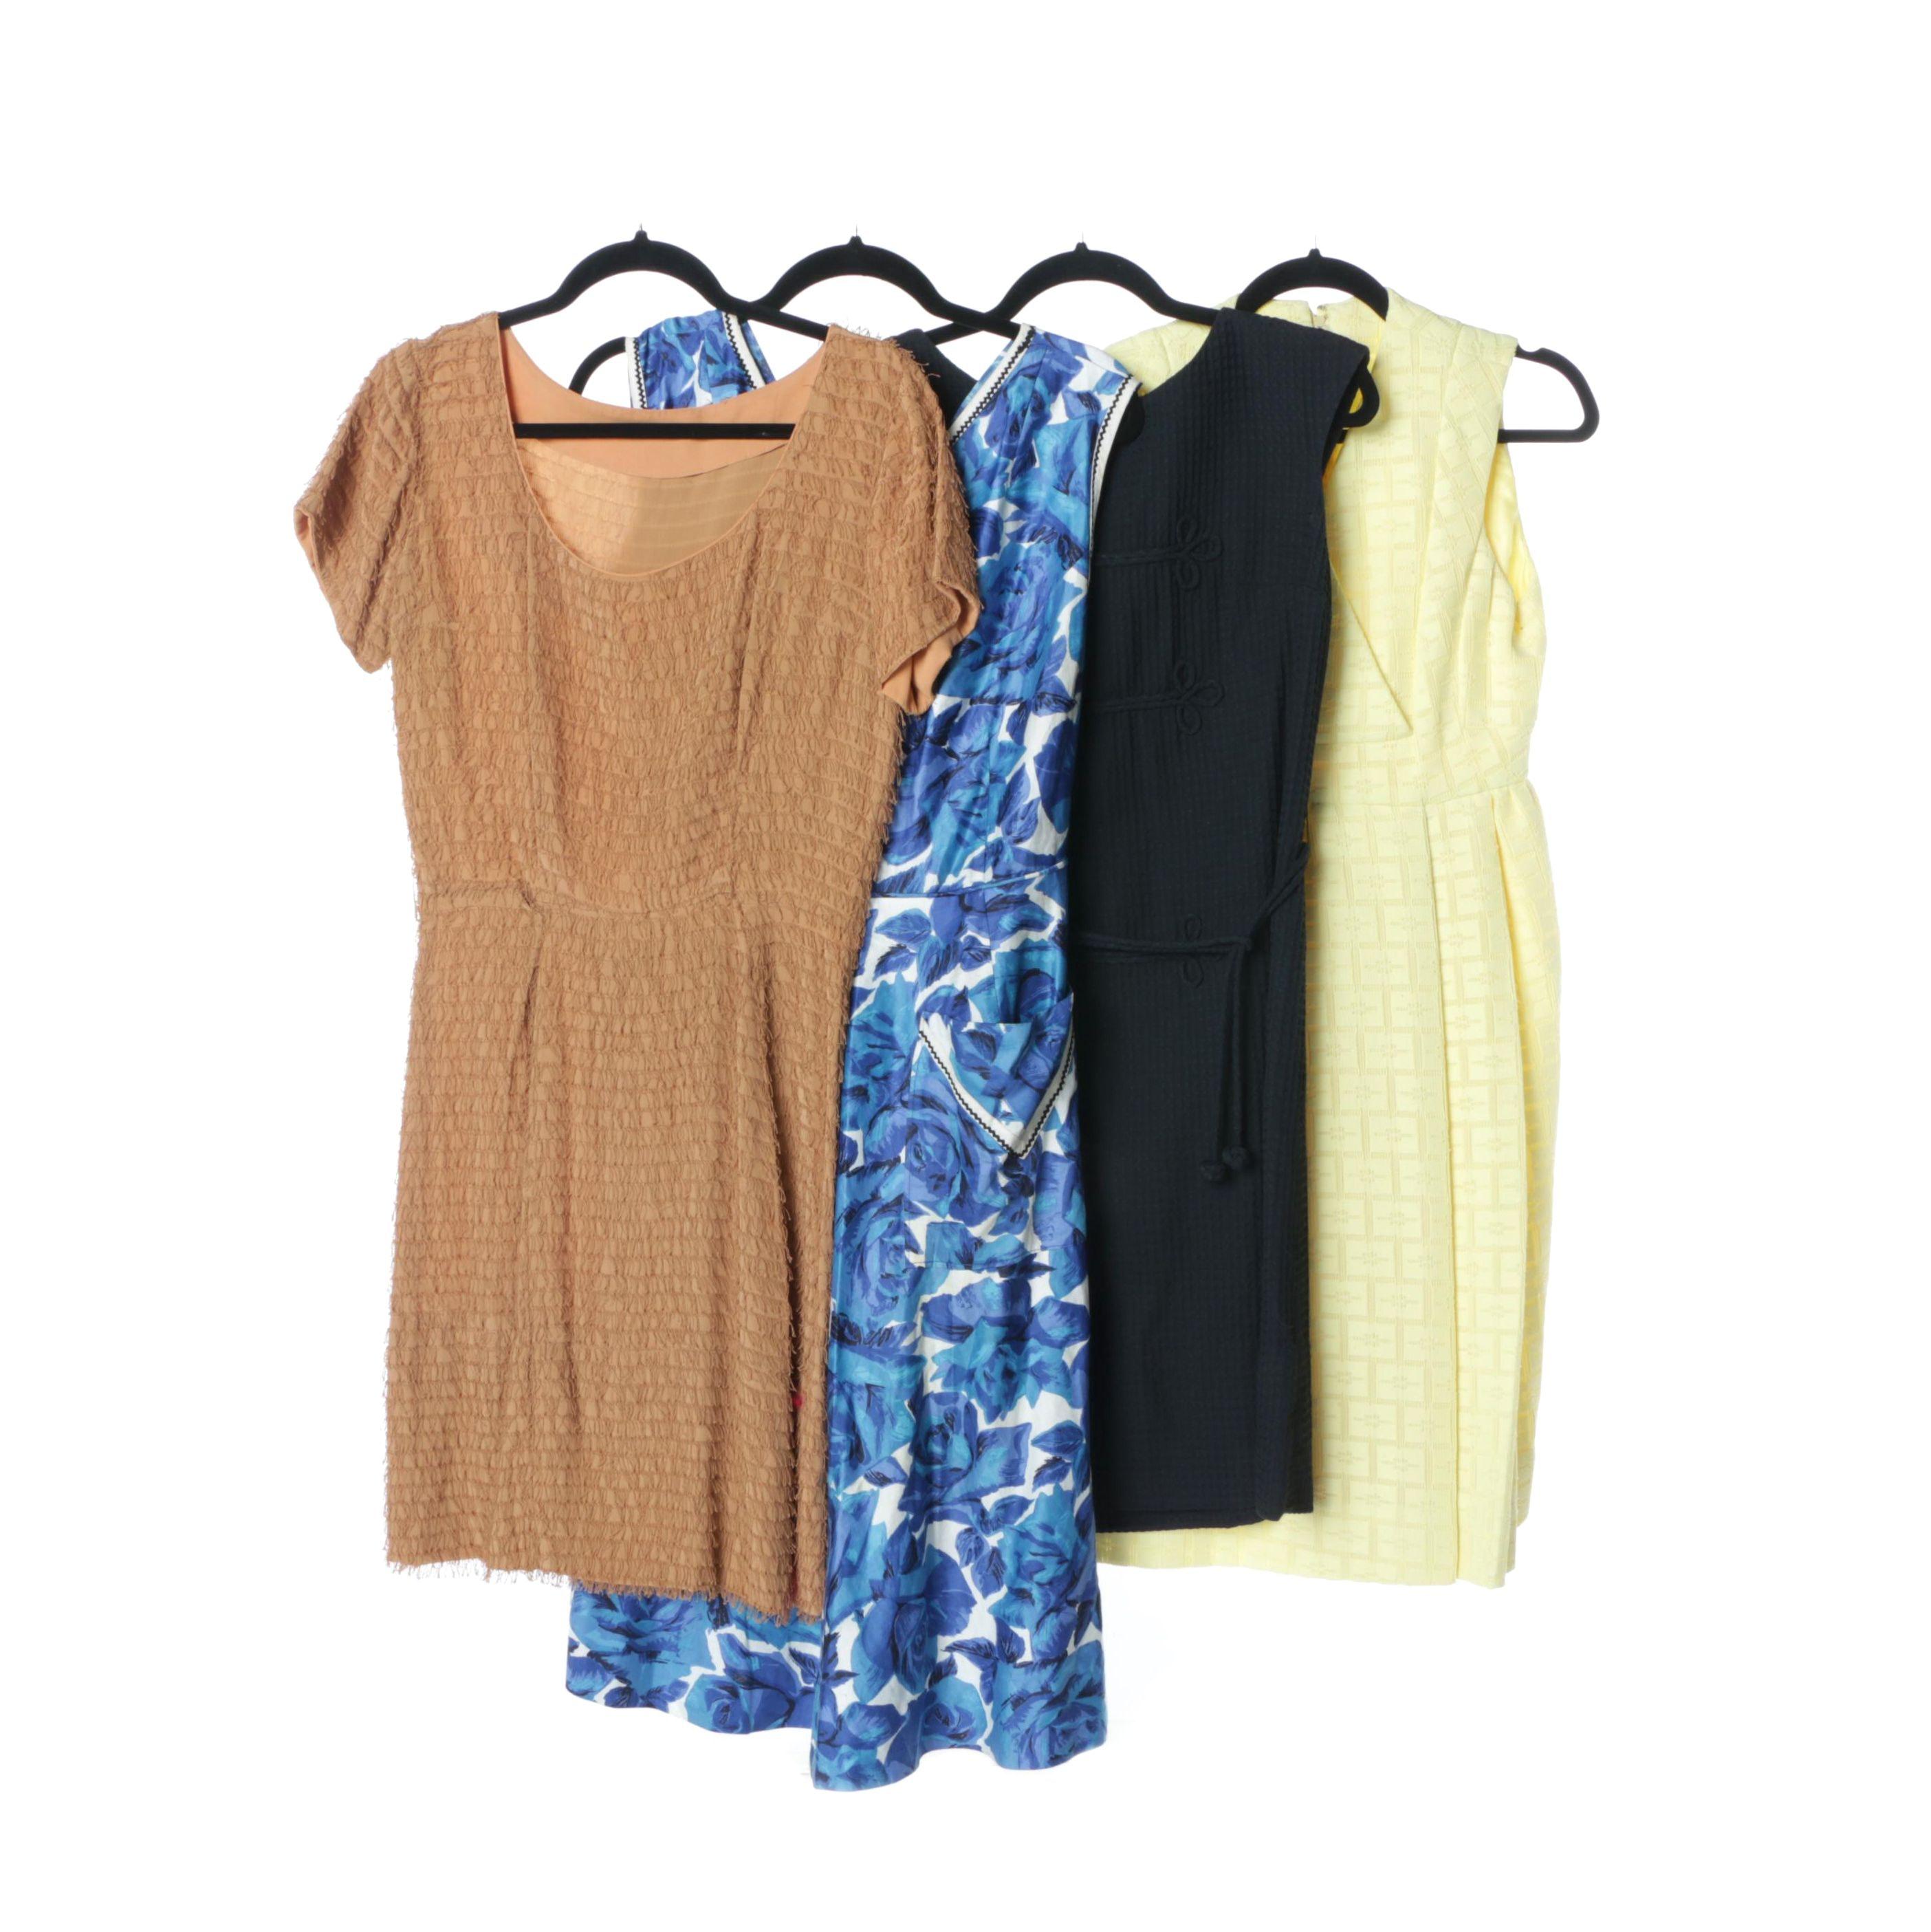 Mid-Century Vintage Summer Dresses Including Bullocks Wilshire